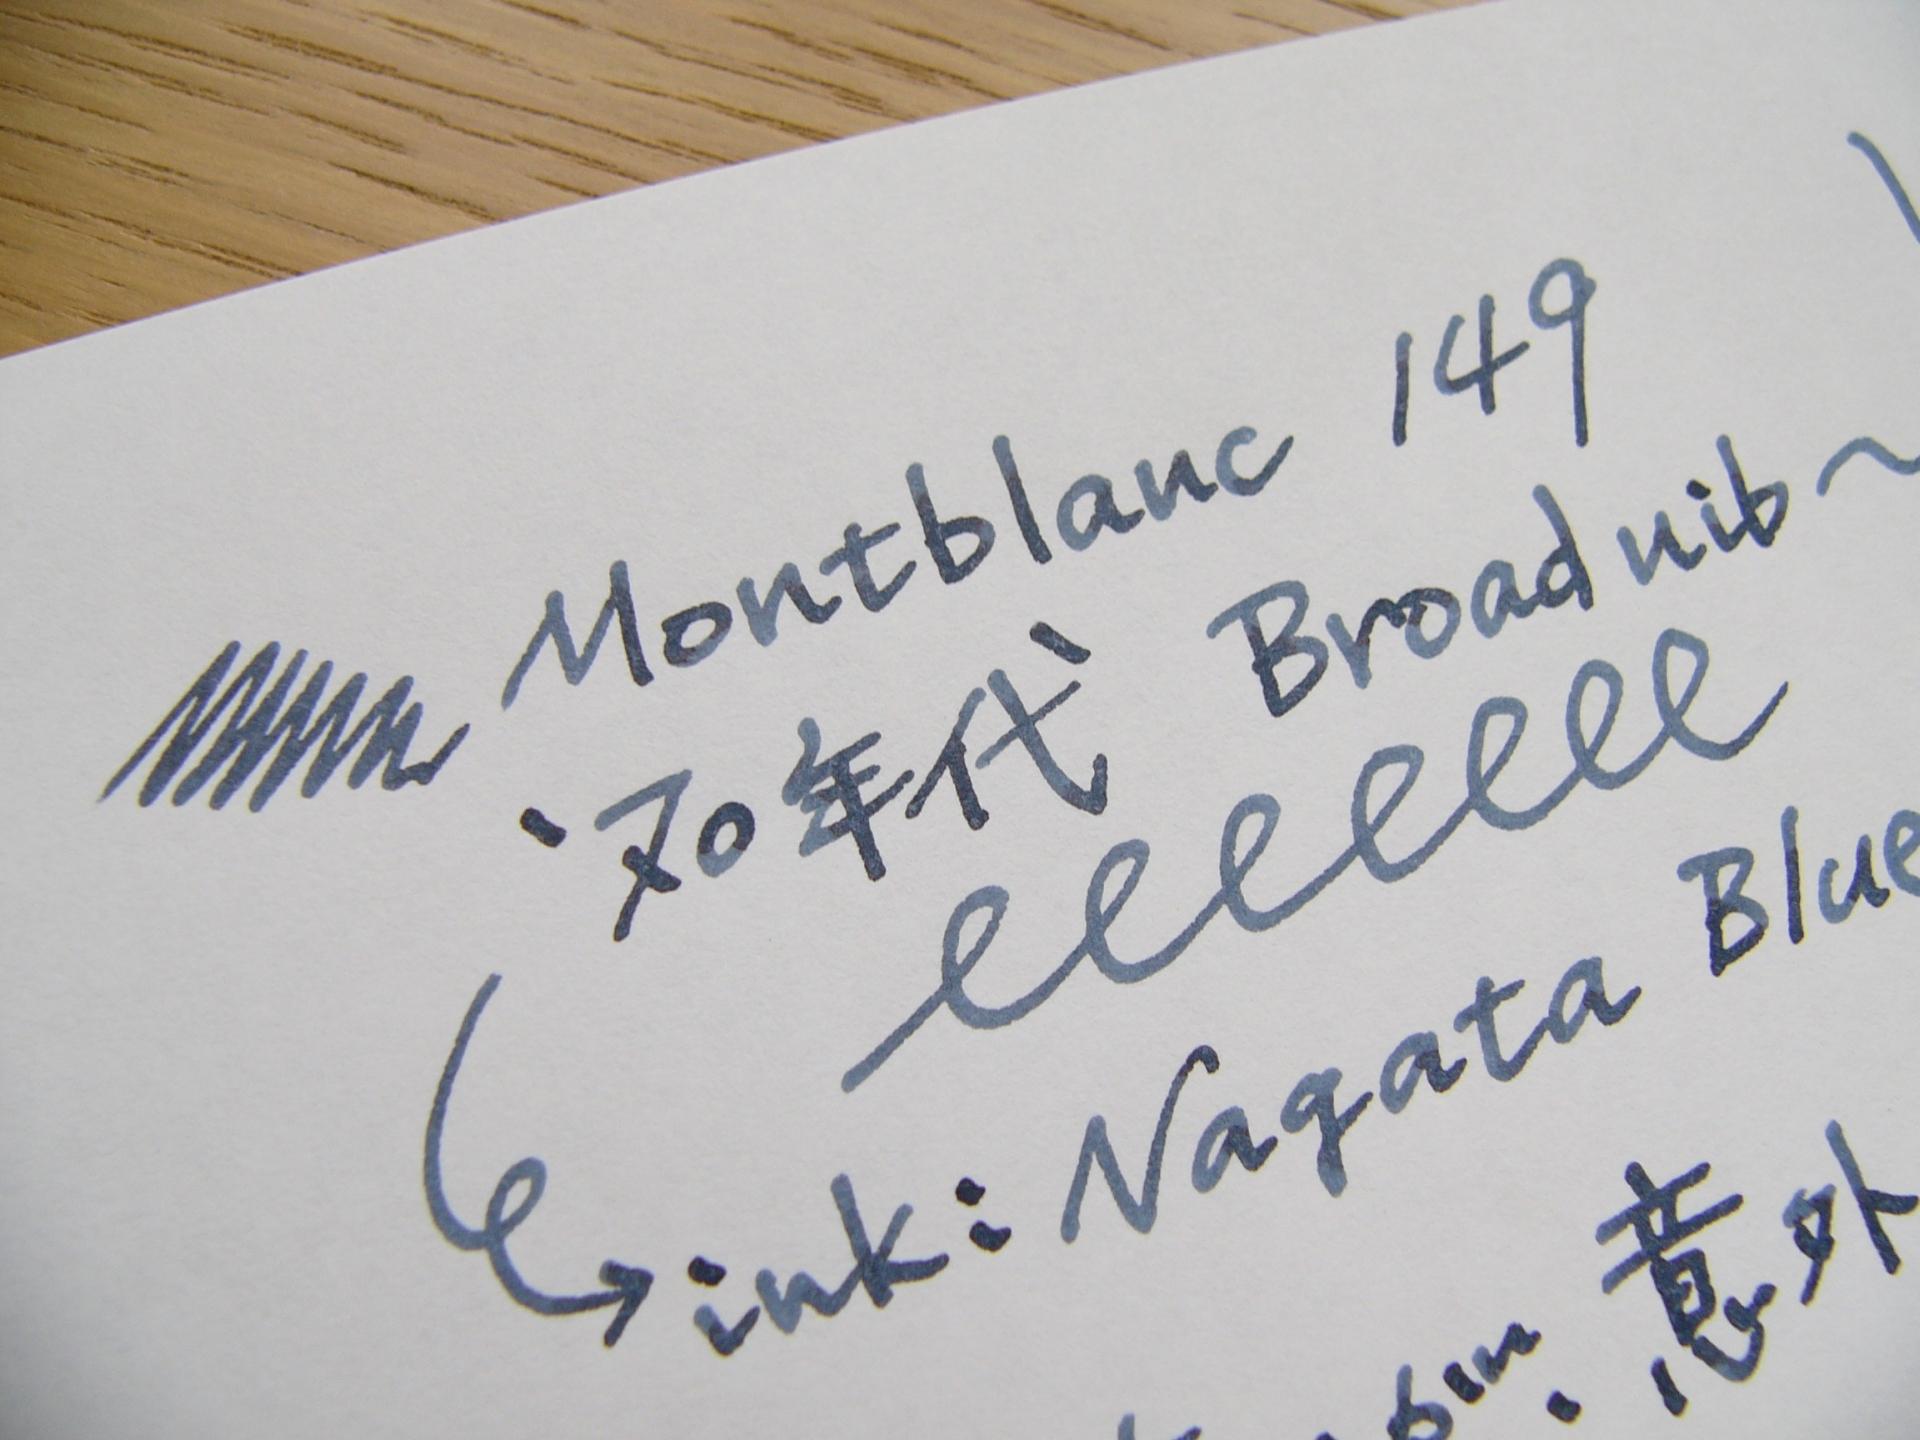 Montblanc 149 Broad 4